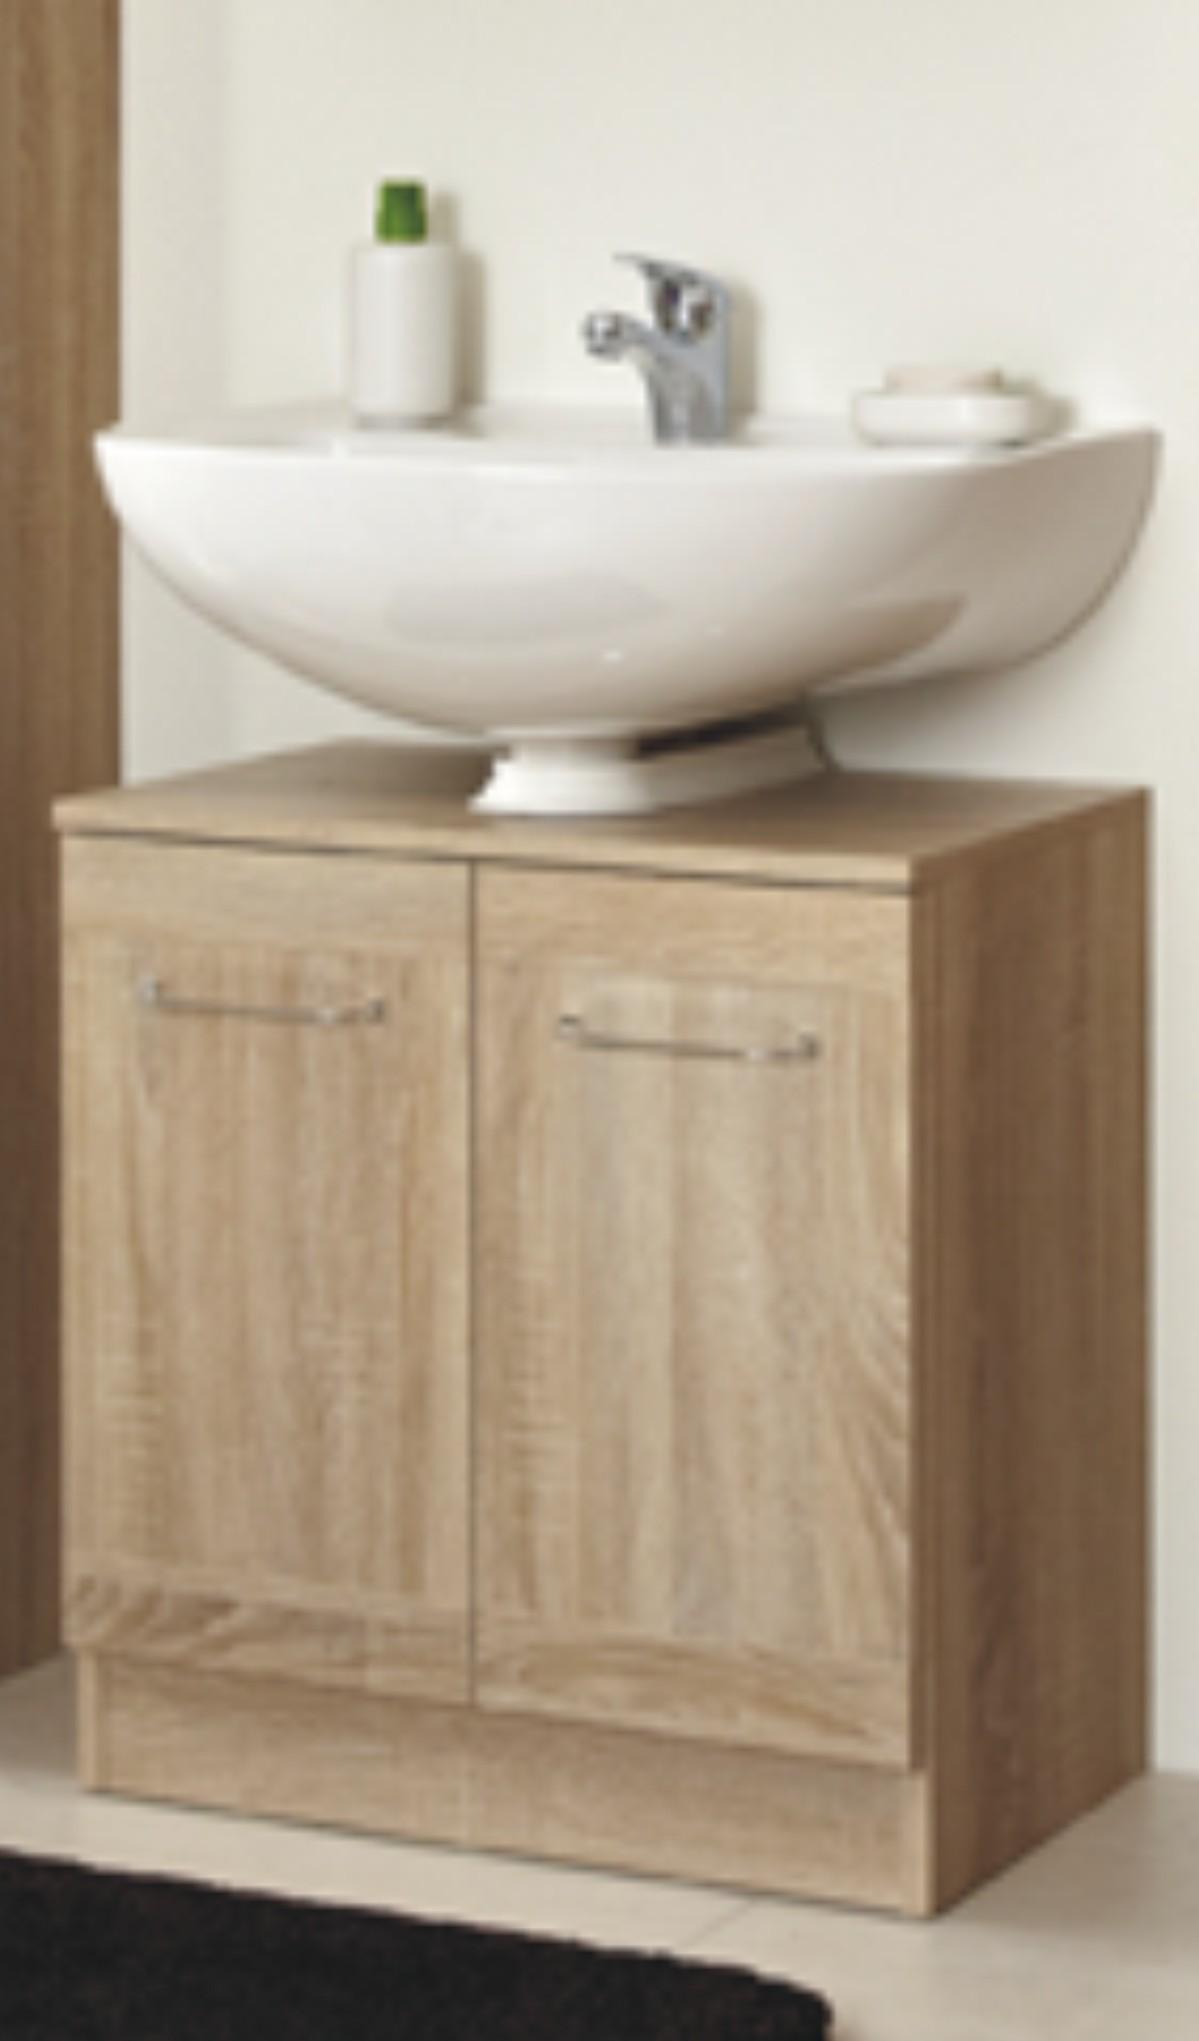 pelipal oliver bam bel universal waschtischunterschrank. Black Bedroom Furniture Sets. Home Design Ideas